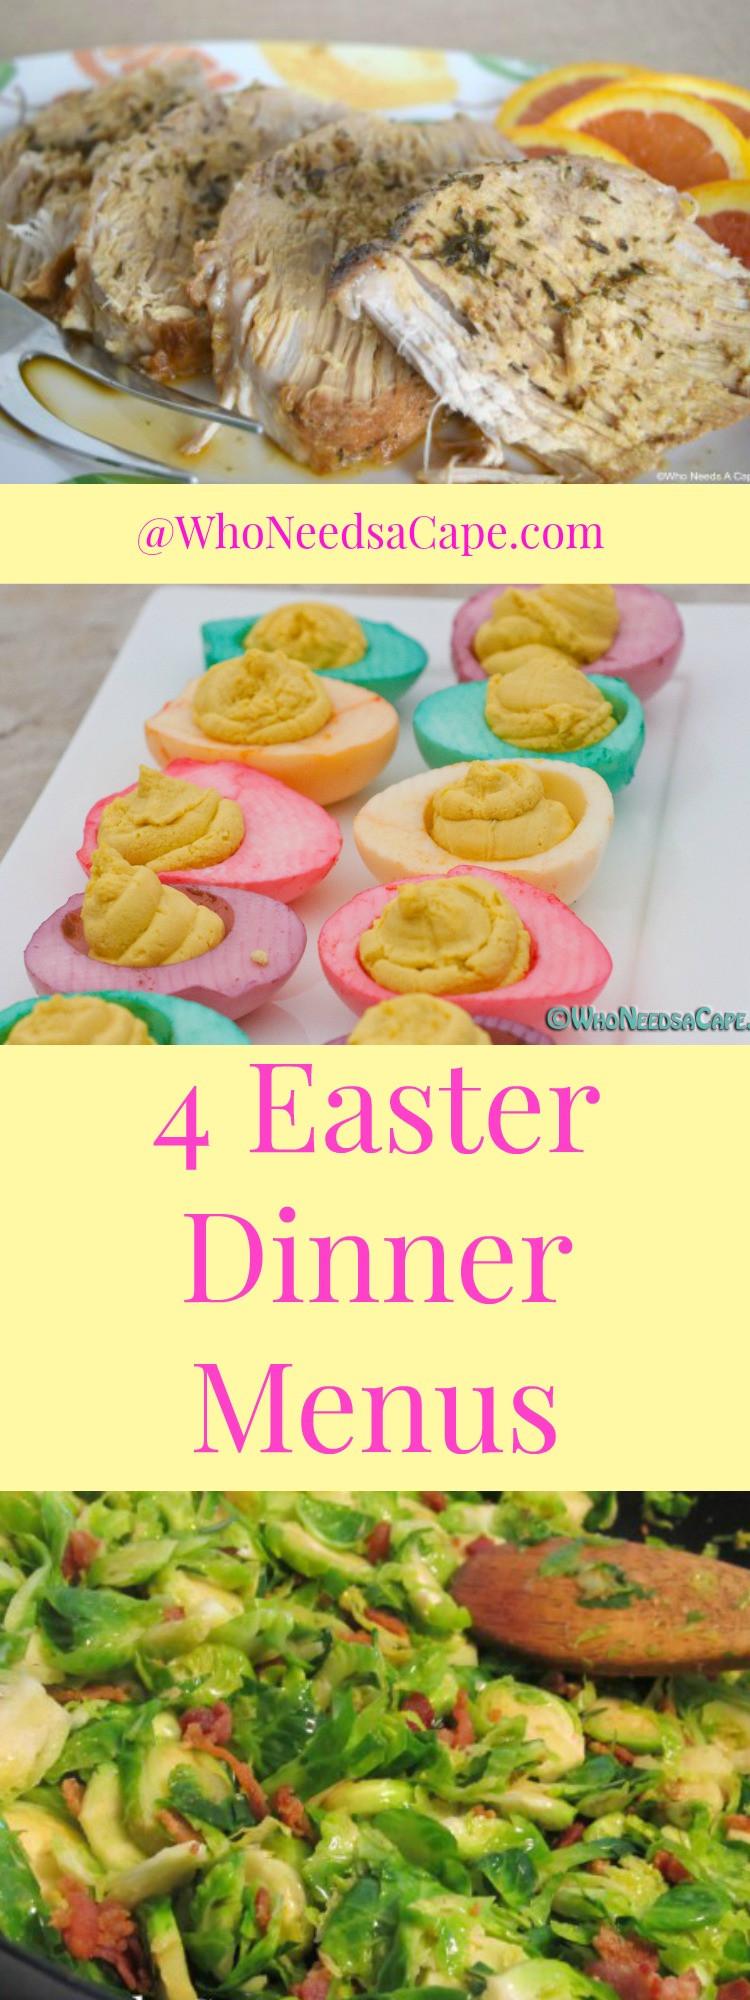 Easter Dinner Menus  Easter Dinner Menus Who Needs A Cape